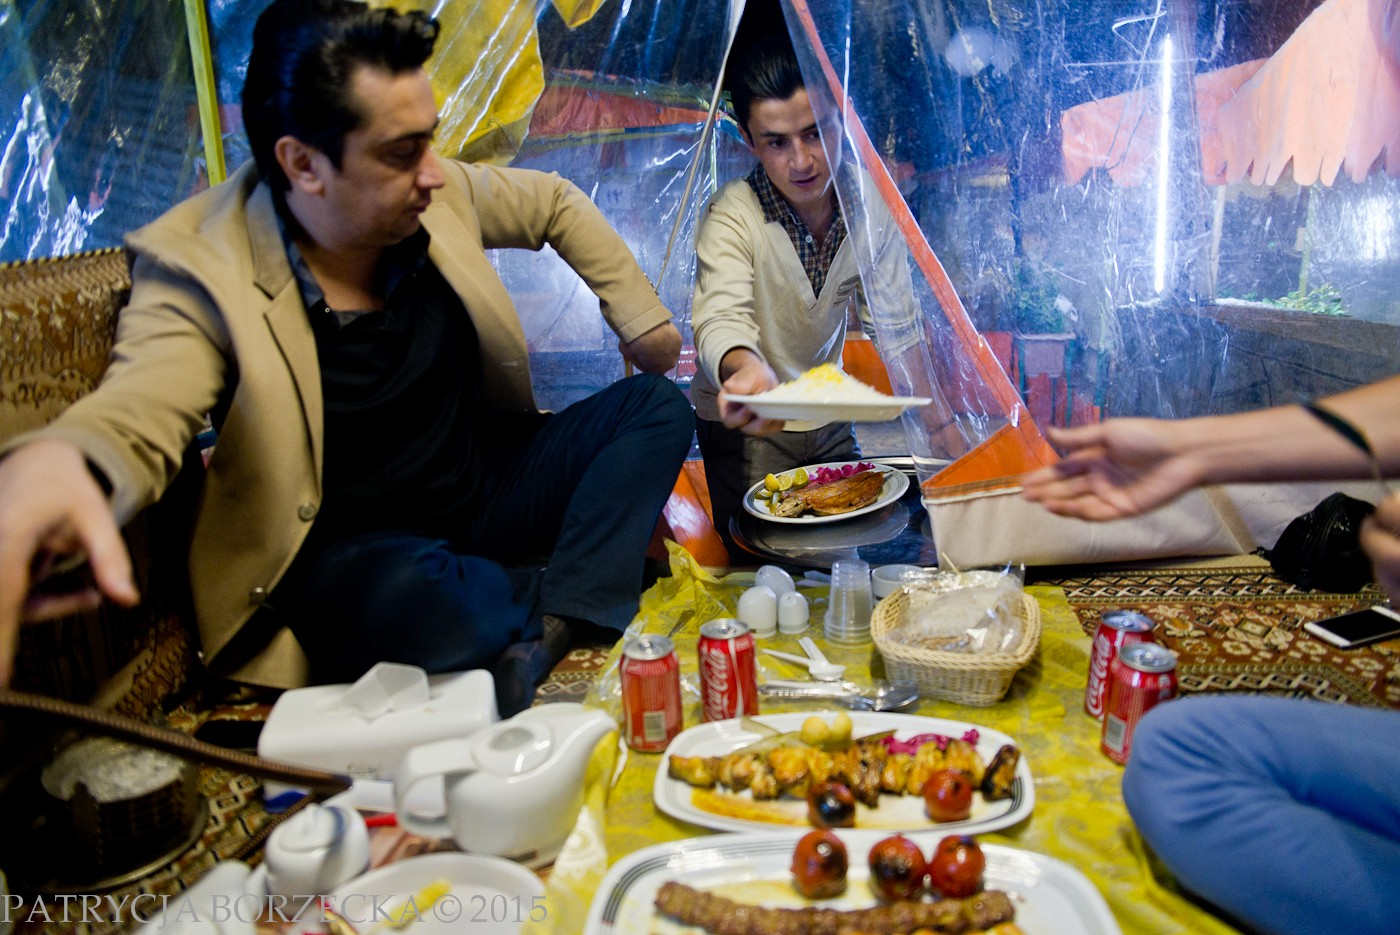 PatrycjaBorzecka-photography-Iran-people14